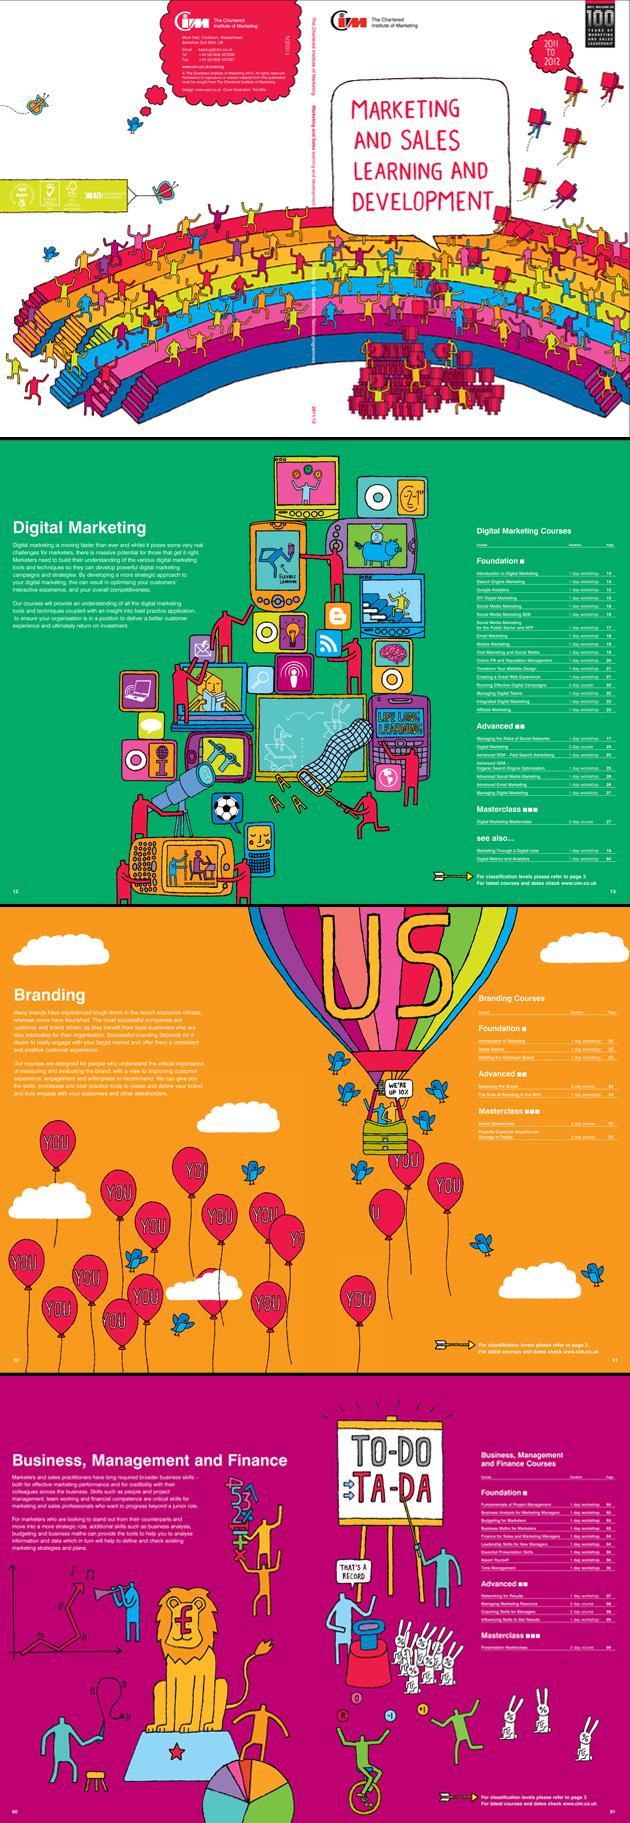 Tim Ellis / The Chartered Institute of Marketing Brochure 2011/12